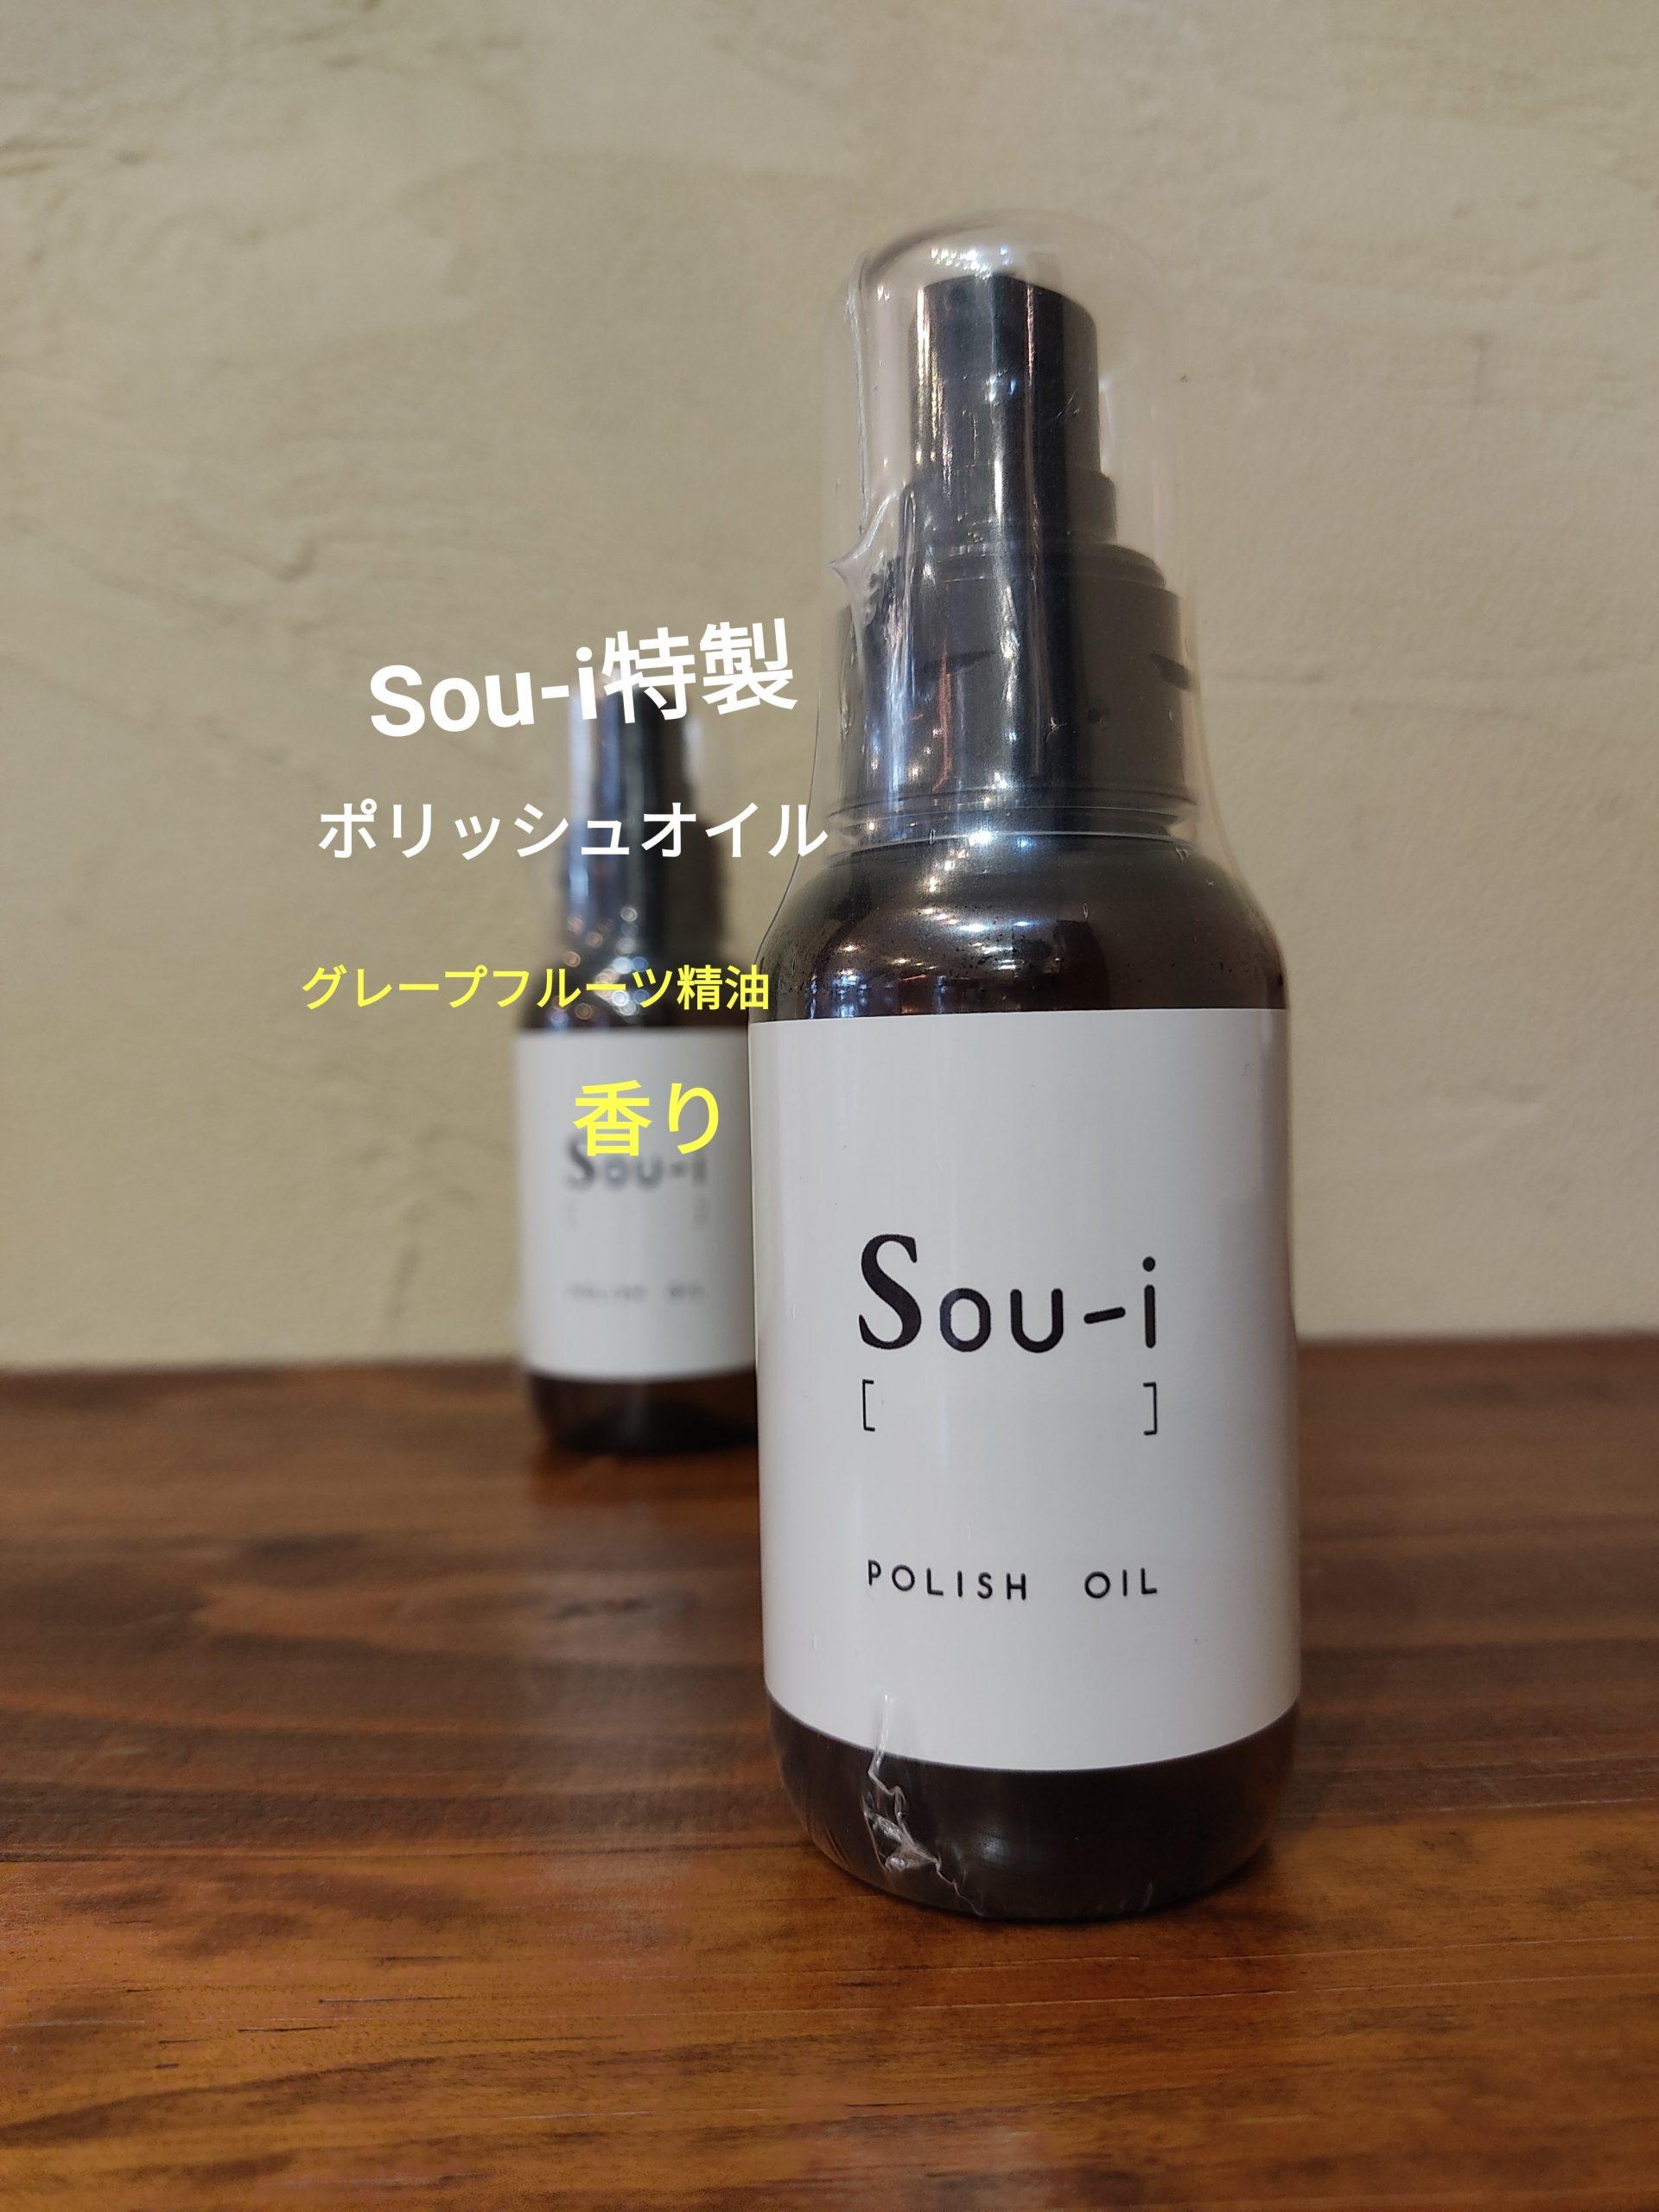 Sou-iポリッシュオイル|Sou-i hair(ソウイヘアー)川崎店